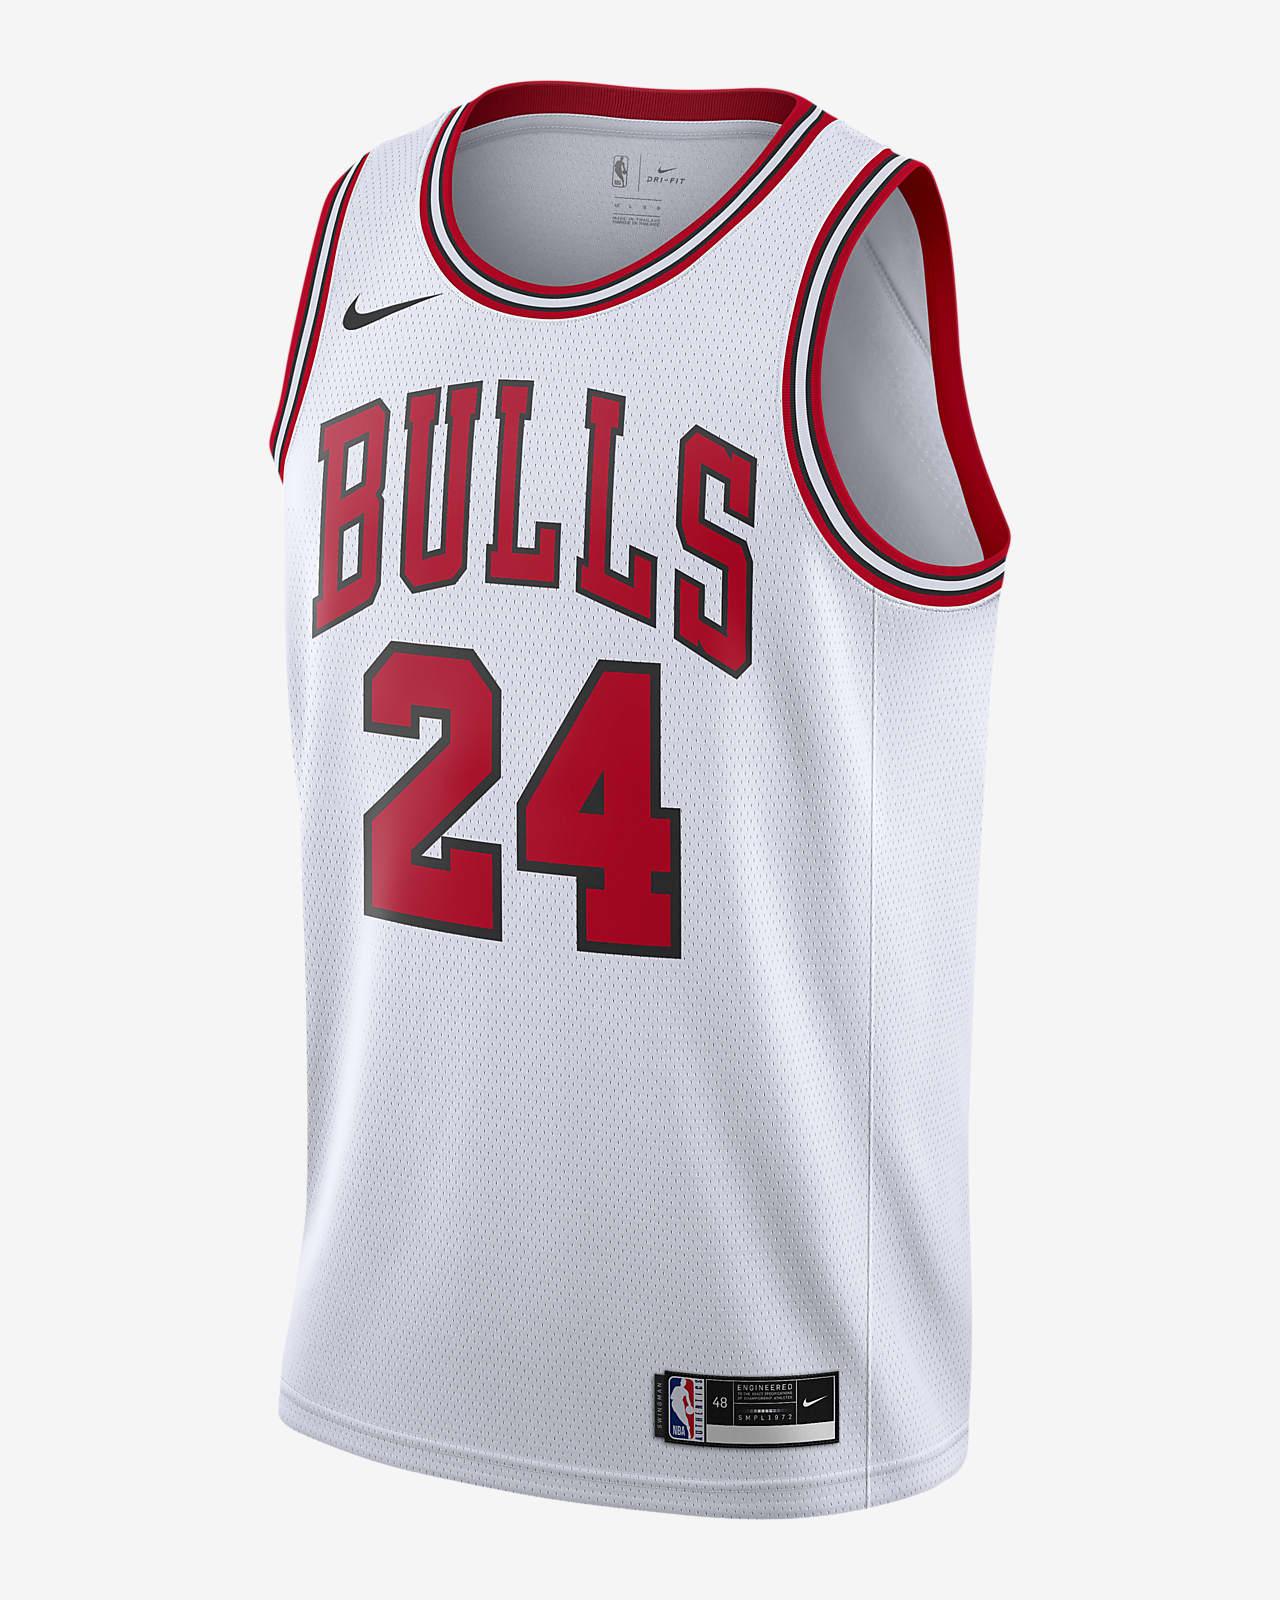 Maillot Nike NBA Swingman Lauri Markkanen Bulls Association Edition 2020